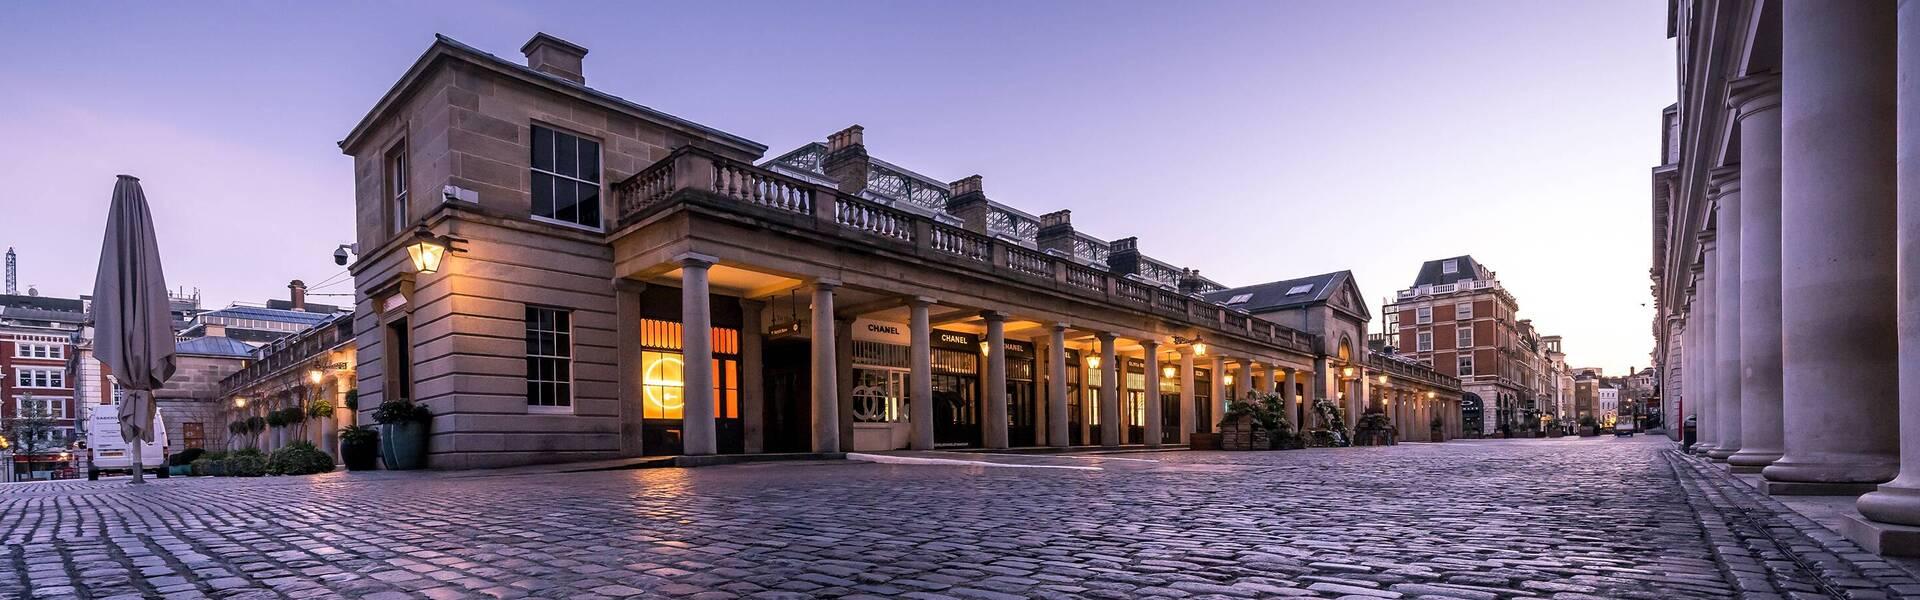 https://d337pdvlg6sju5.cloudfront.net/media/images/properties/united-kingdom/london/strand-palace/offers/adobestock-341046940_501_1920x600.jpg